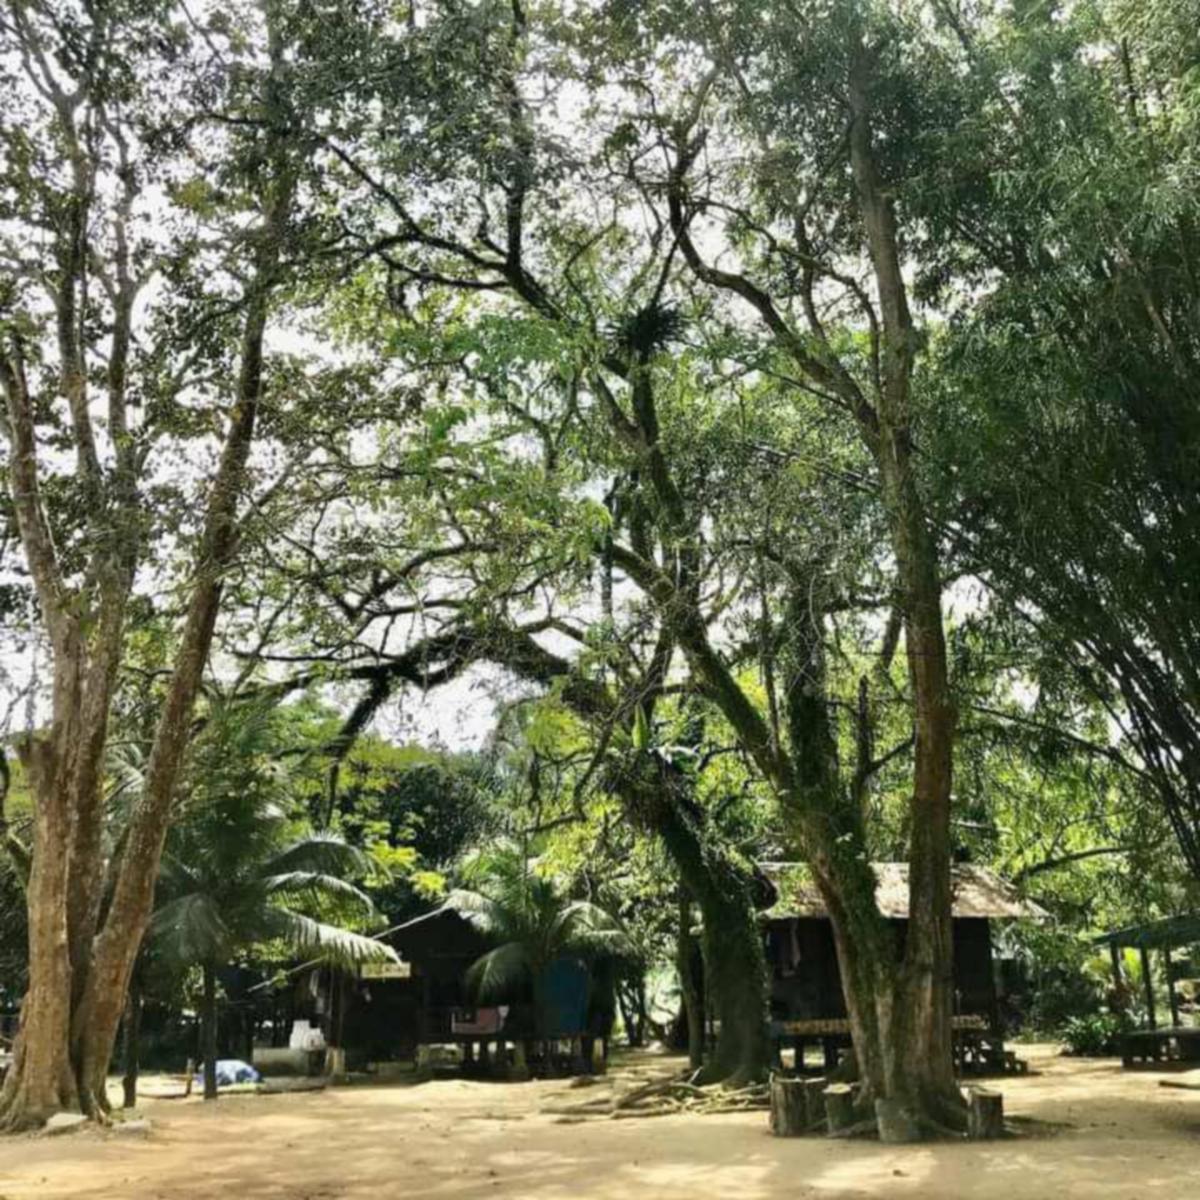 PERKAMPUNGAN Warisan Budaya Pulau Misa Melayu cukup unik dengan senario peradaban Melayu lama.